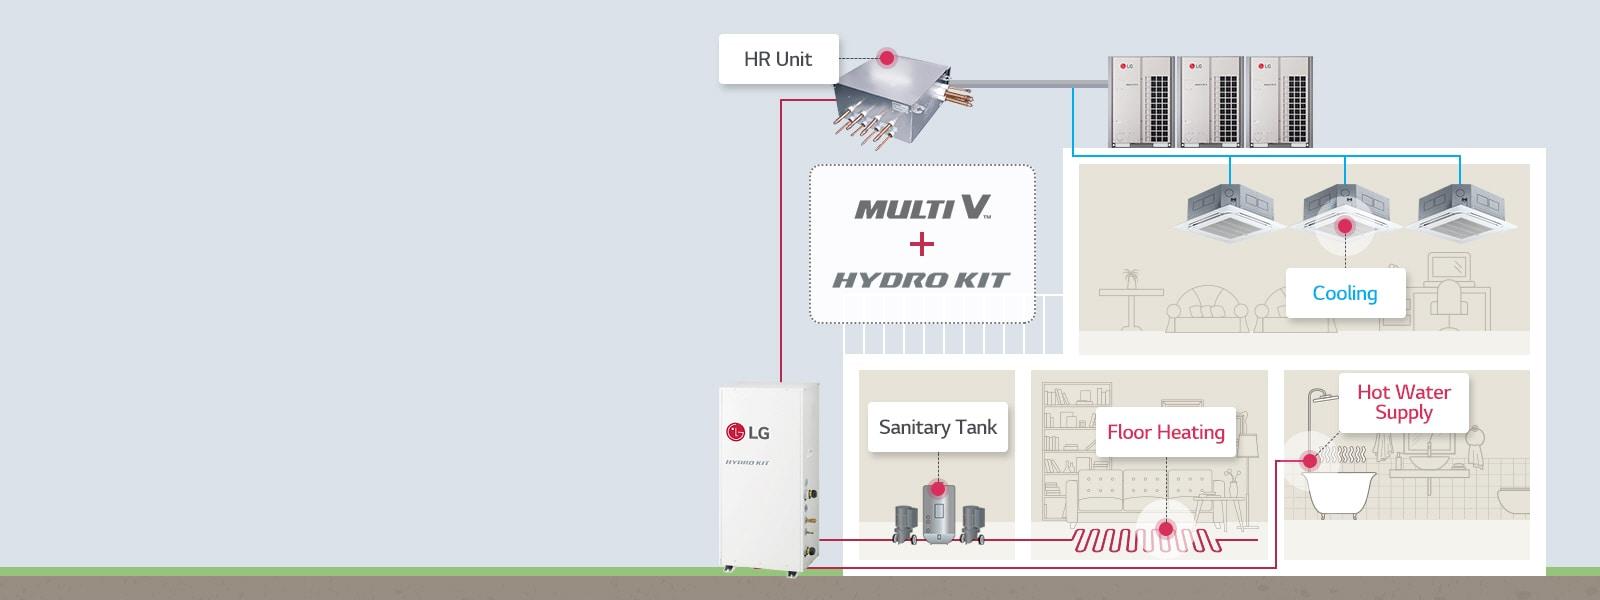 Lg multi v service manual